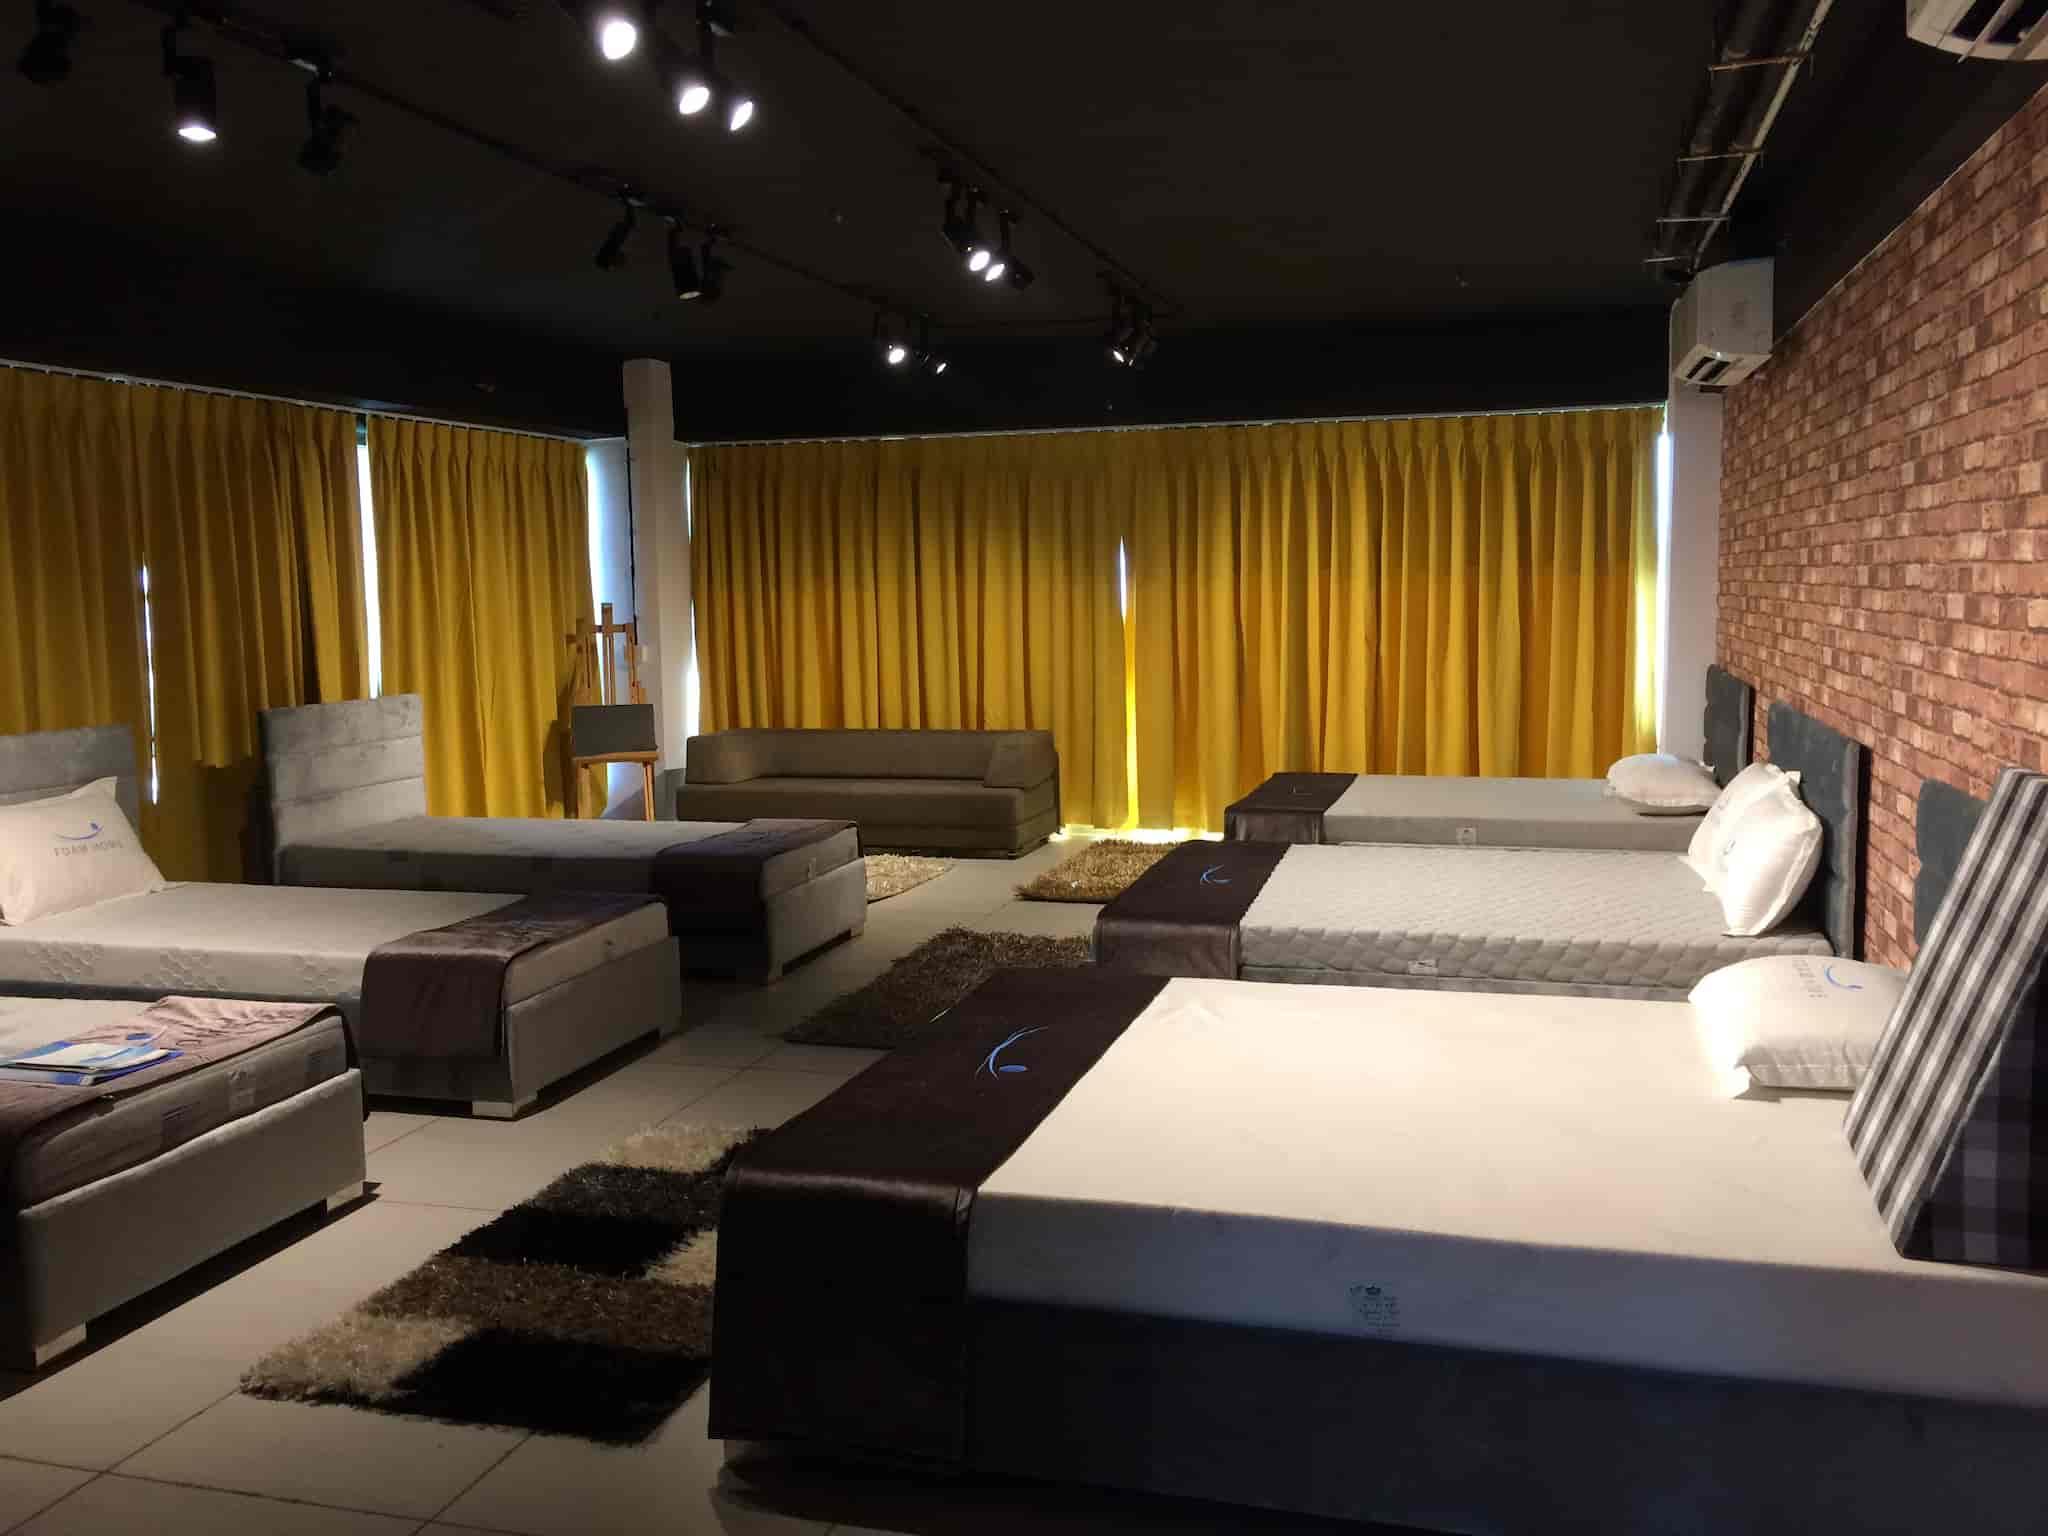 Kurlon mattress price in bangalore dating